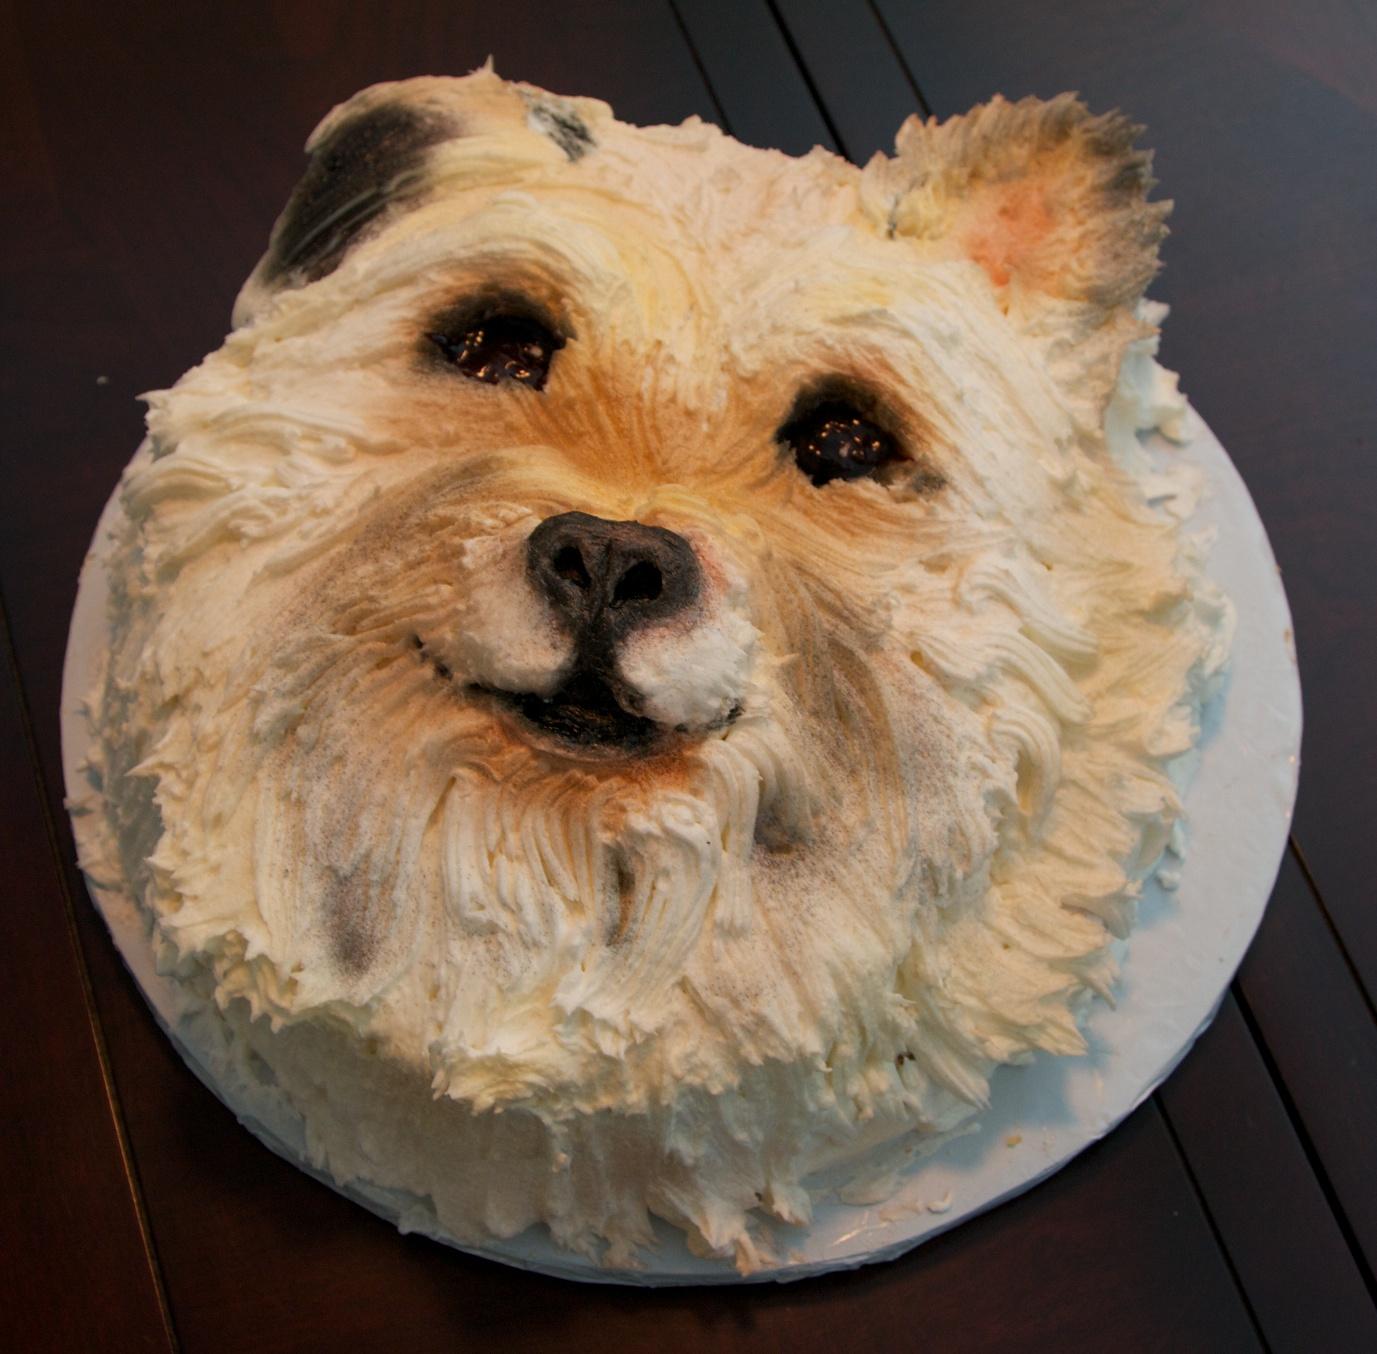 The cutest birthday cake ever sweet sensibility for How to make the best birthday cake ever